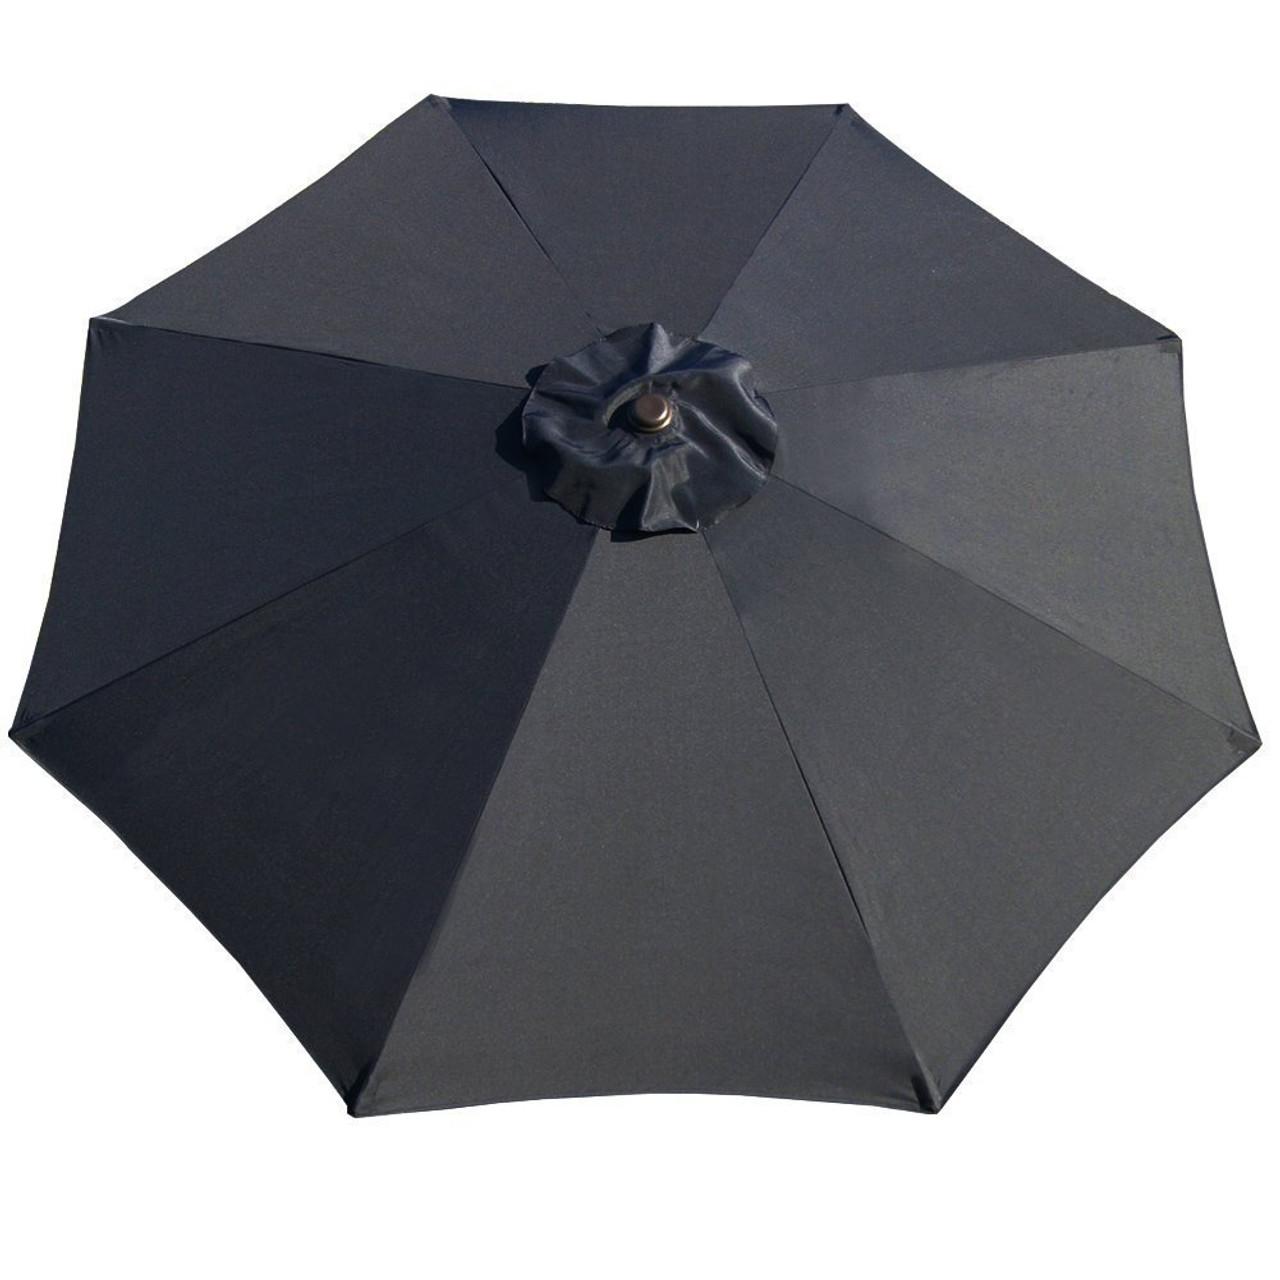 9 Feet Patio Umbrella Replacement Cover For 8 Ribs Yard Garden Polyester  (Black)